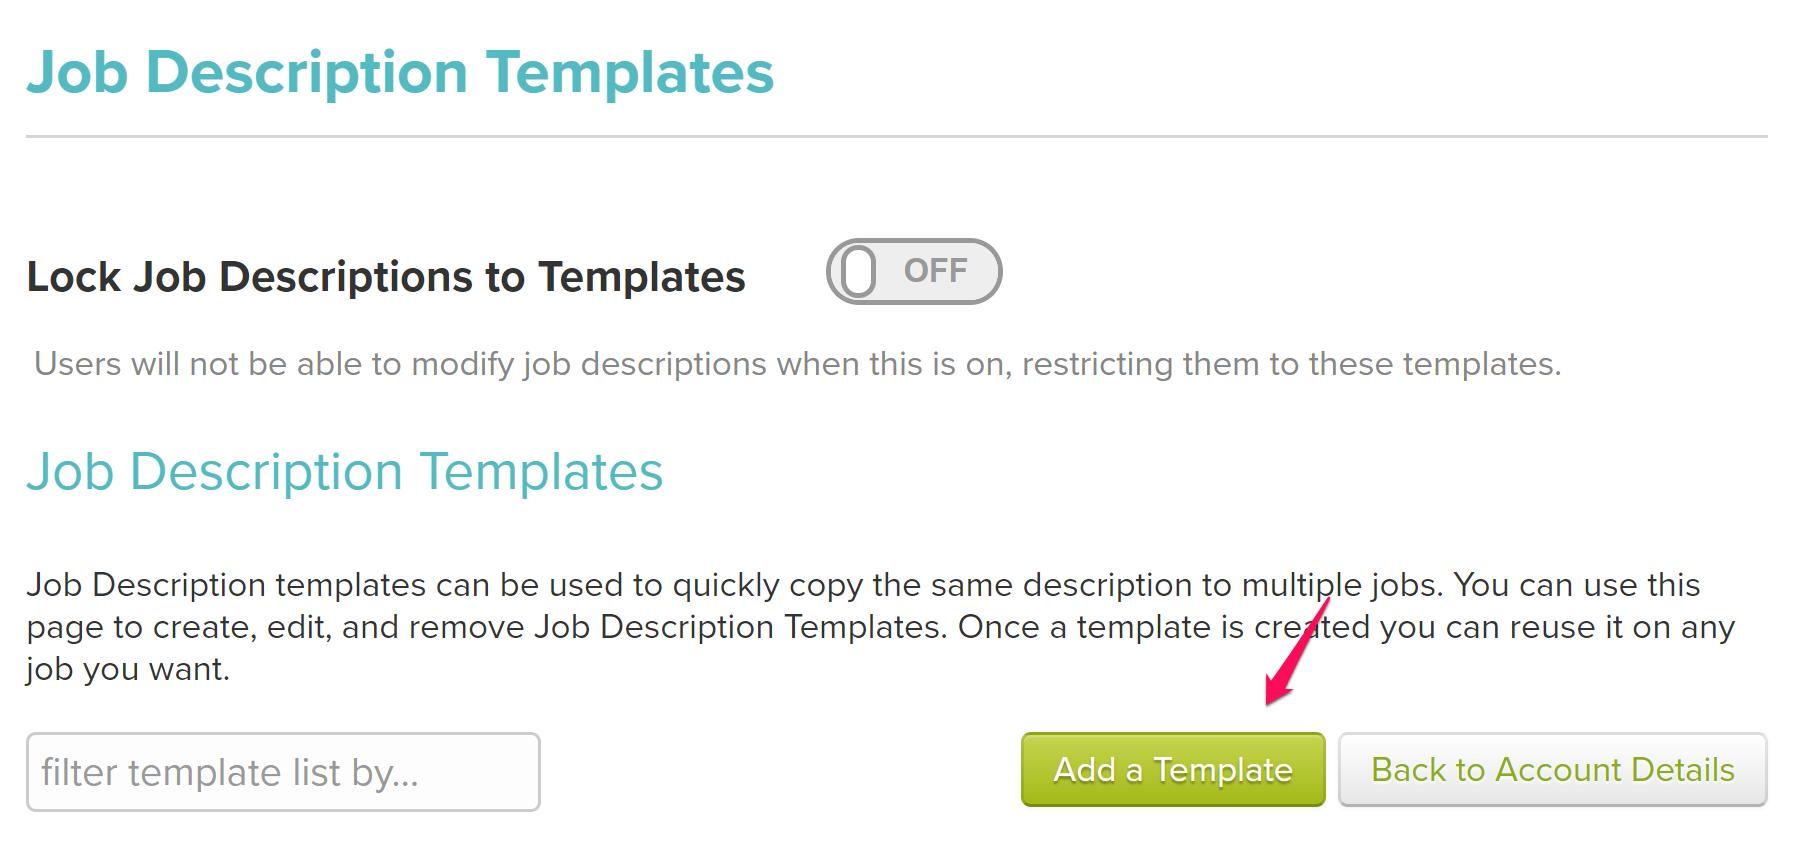 Job Description Templates : HiringThing Support